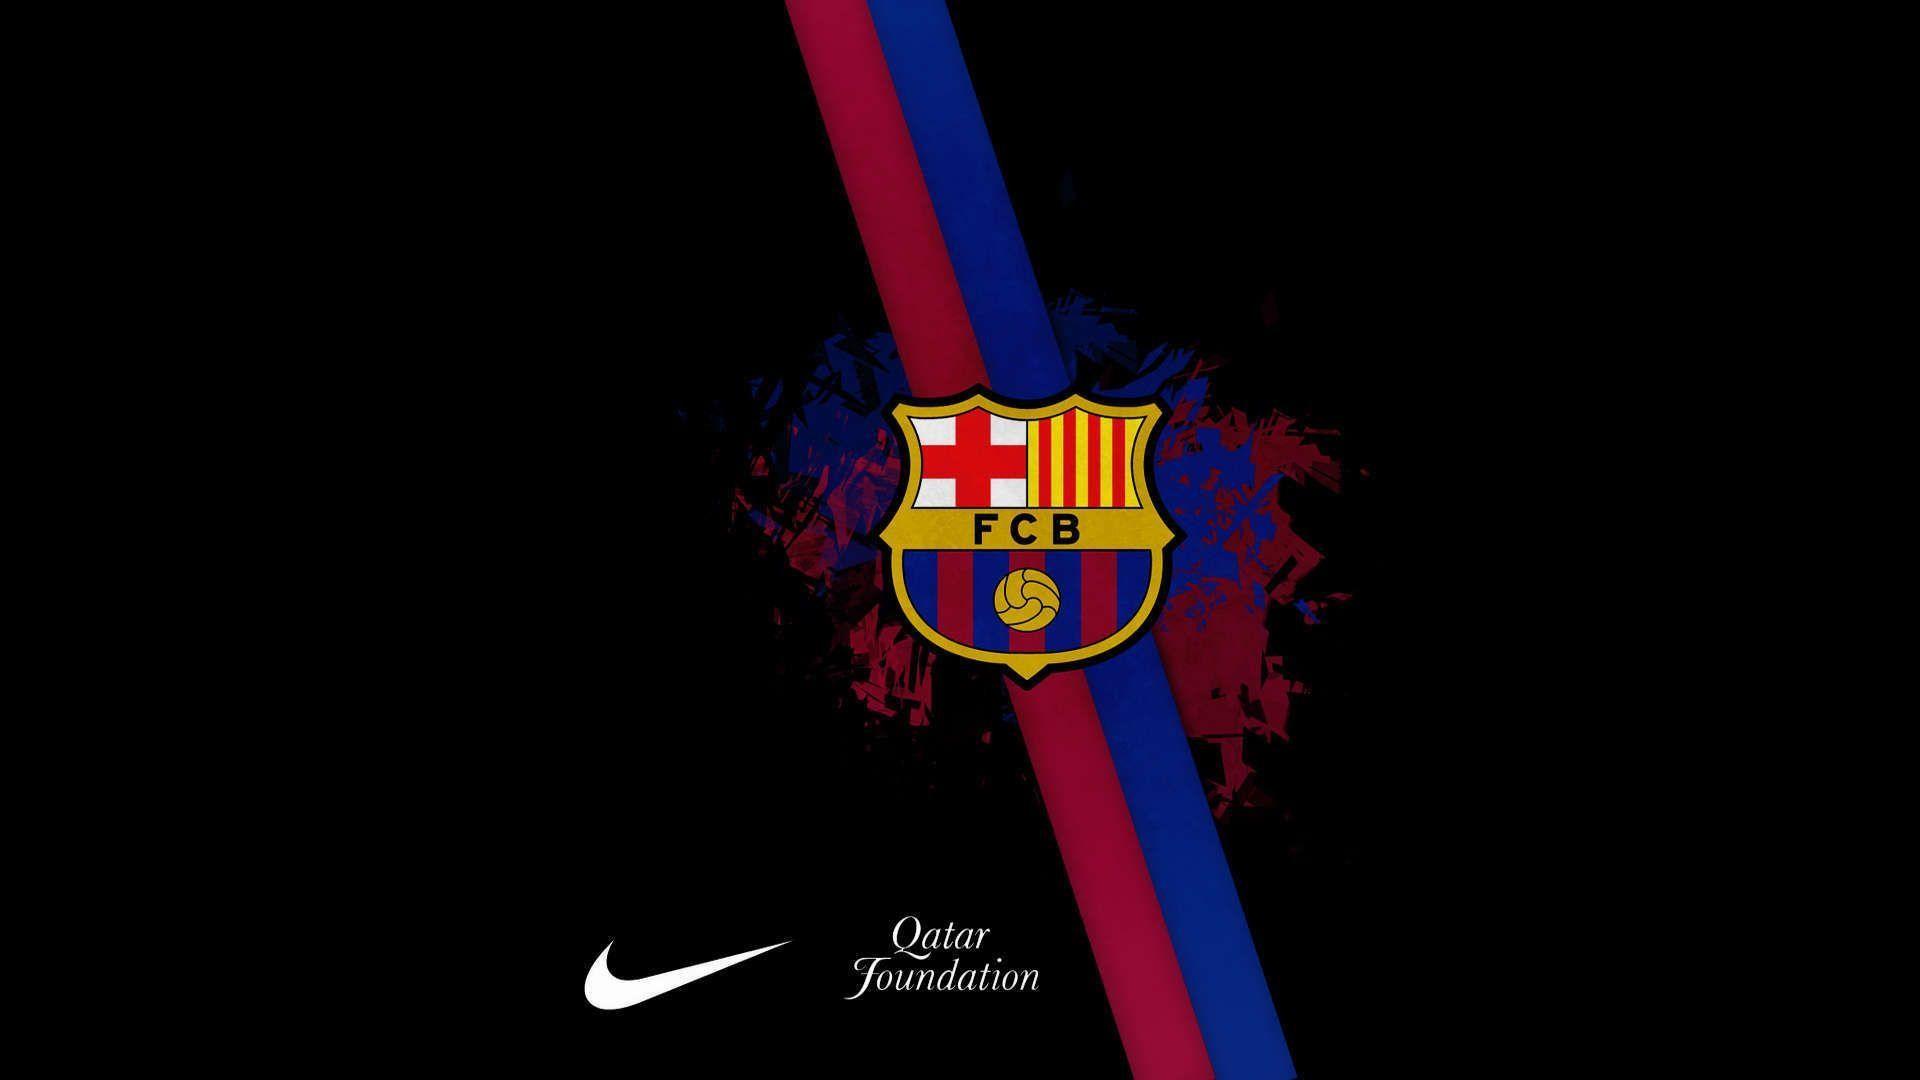 FC Barcelona Logo Wallpaper Download | HD Wallpapers, Backgrounds .